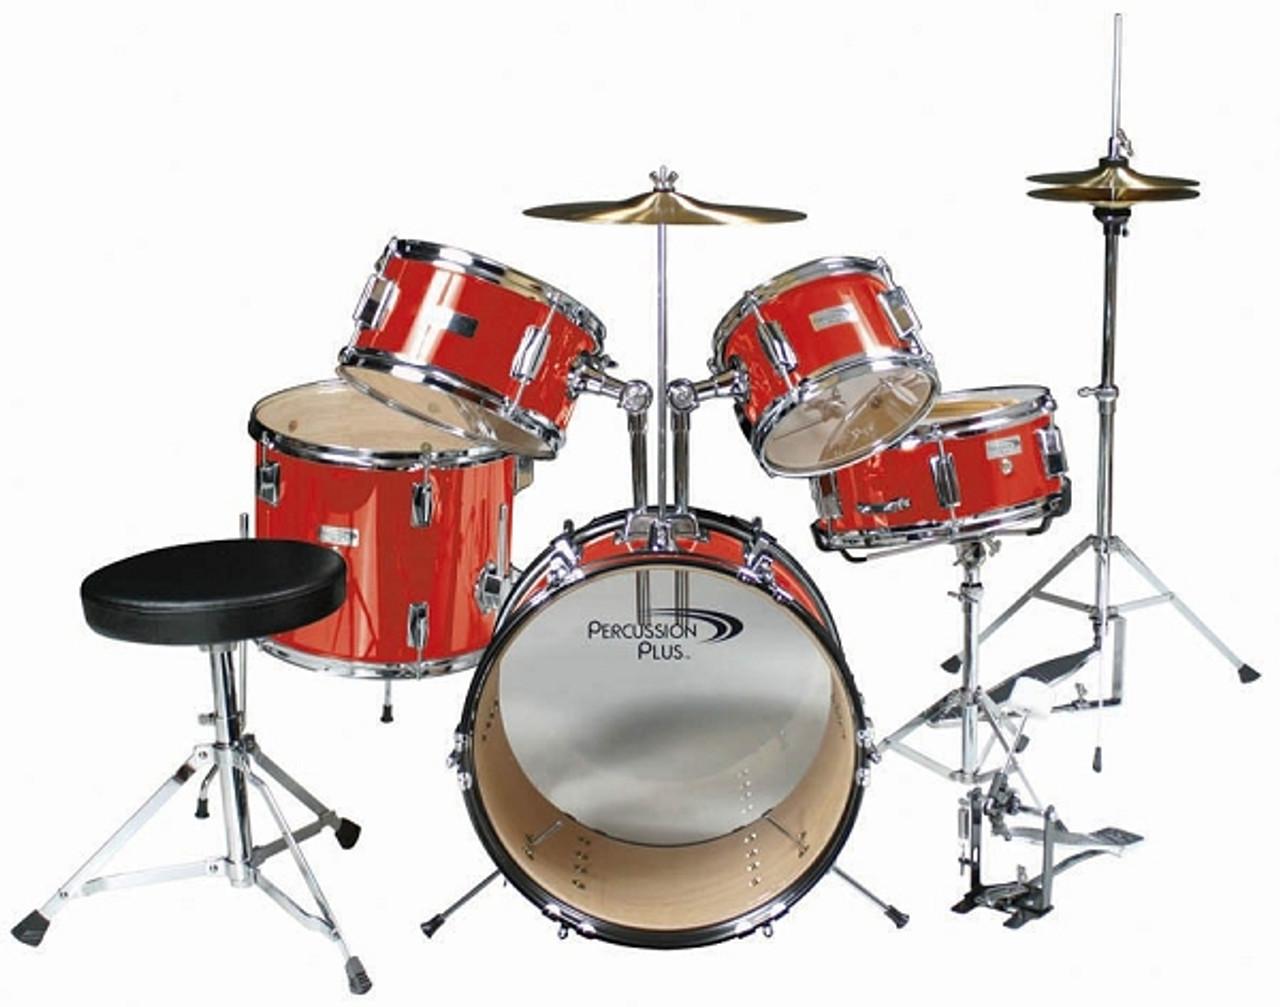 percussion plus 5 piece junior drum set red gearclubdirect. Black Bedroom Furniture Sets. Home Design Ideas